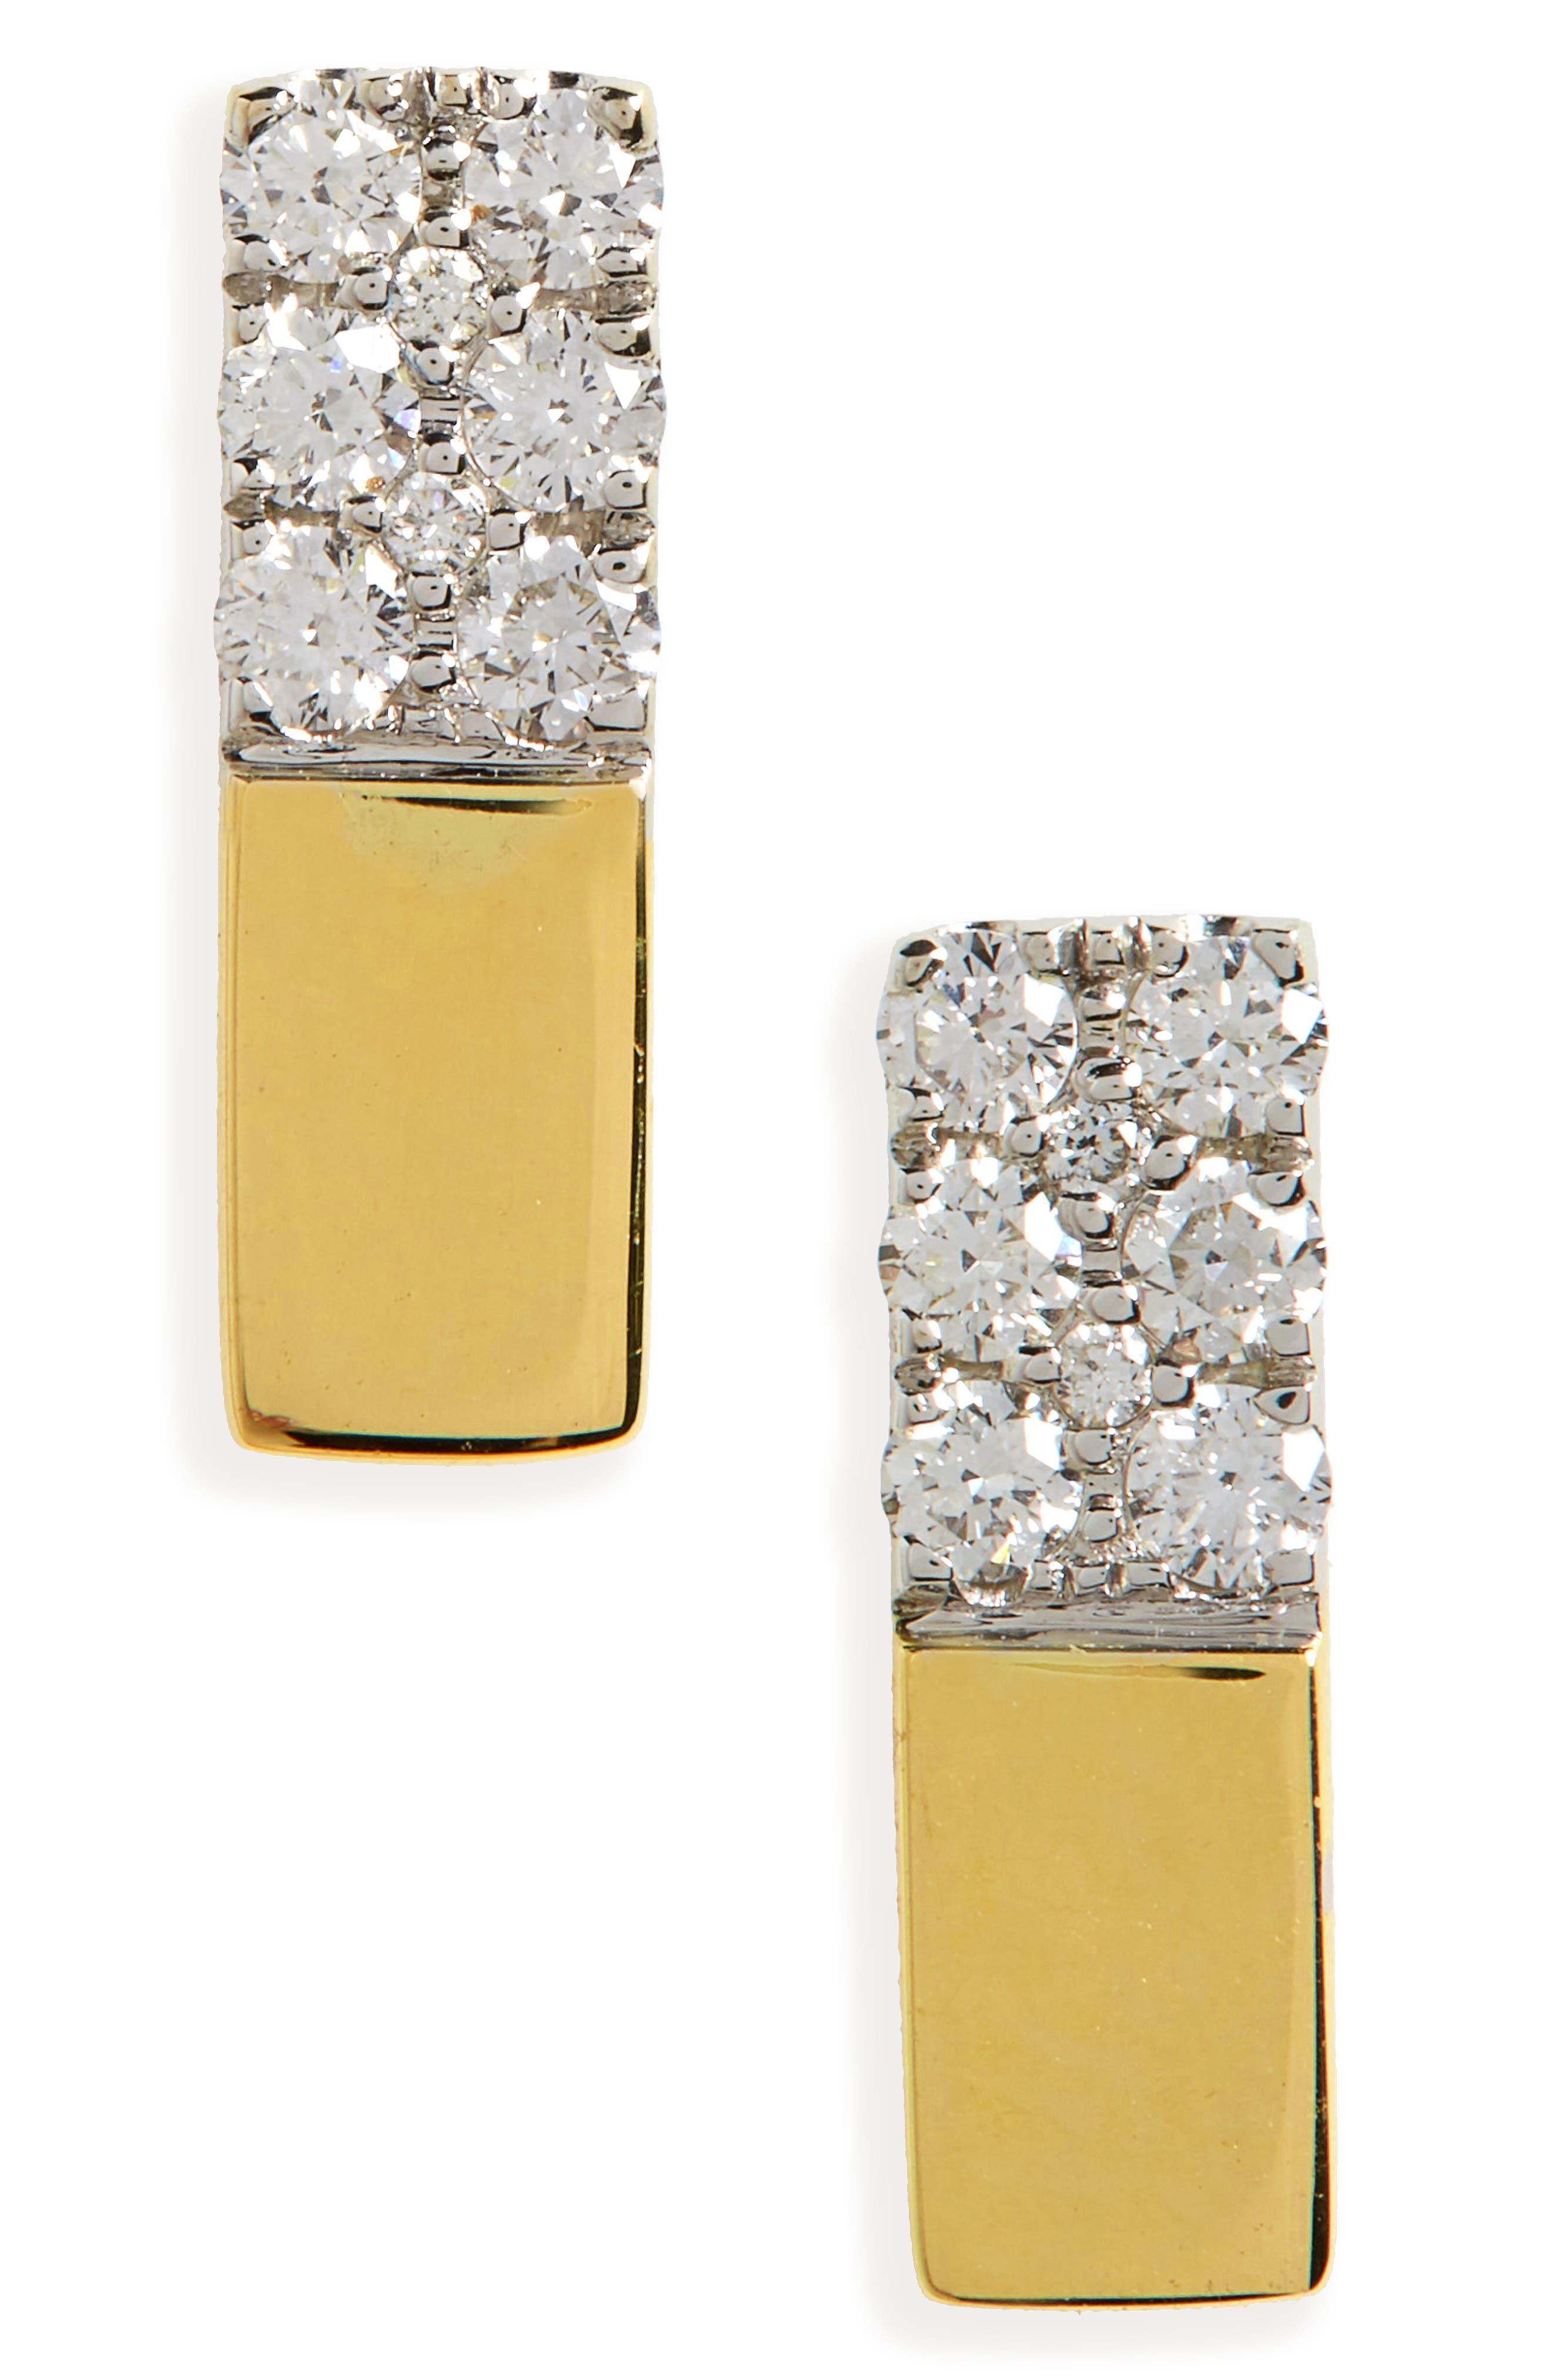 Kiera Diamond & 18K Gold Bar Stud Earrings,                             Main thumbnail 1, color,                             Yellow Gold/ White Gold